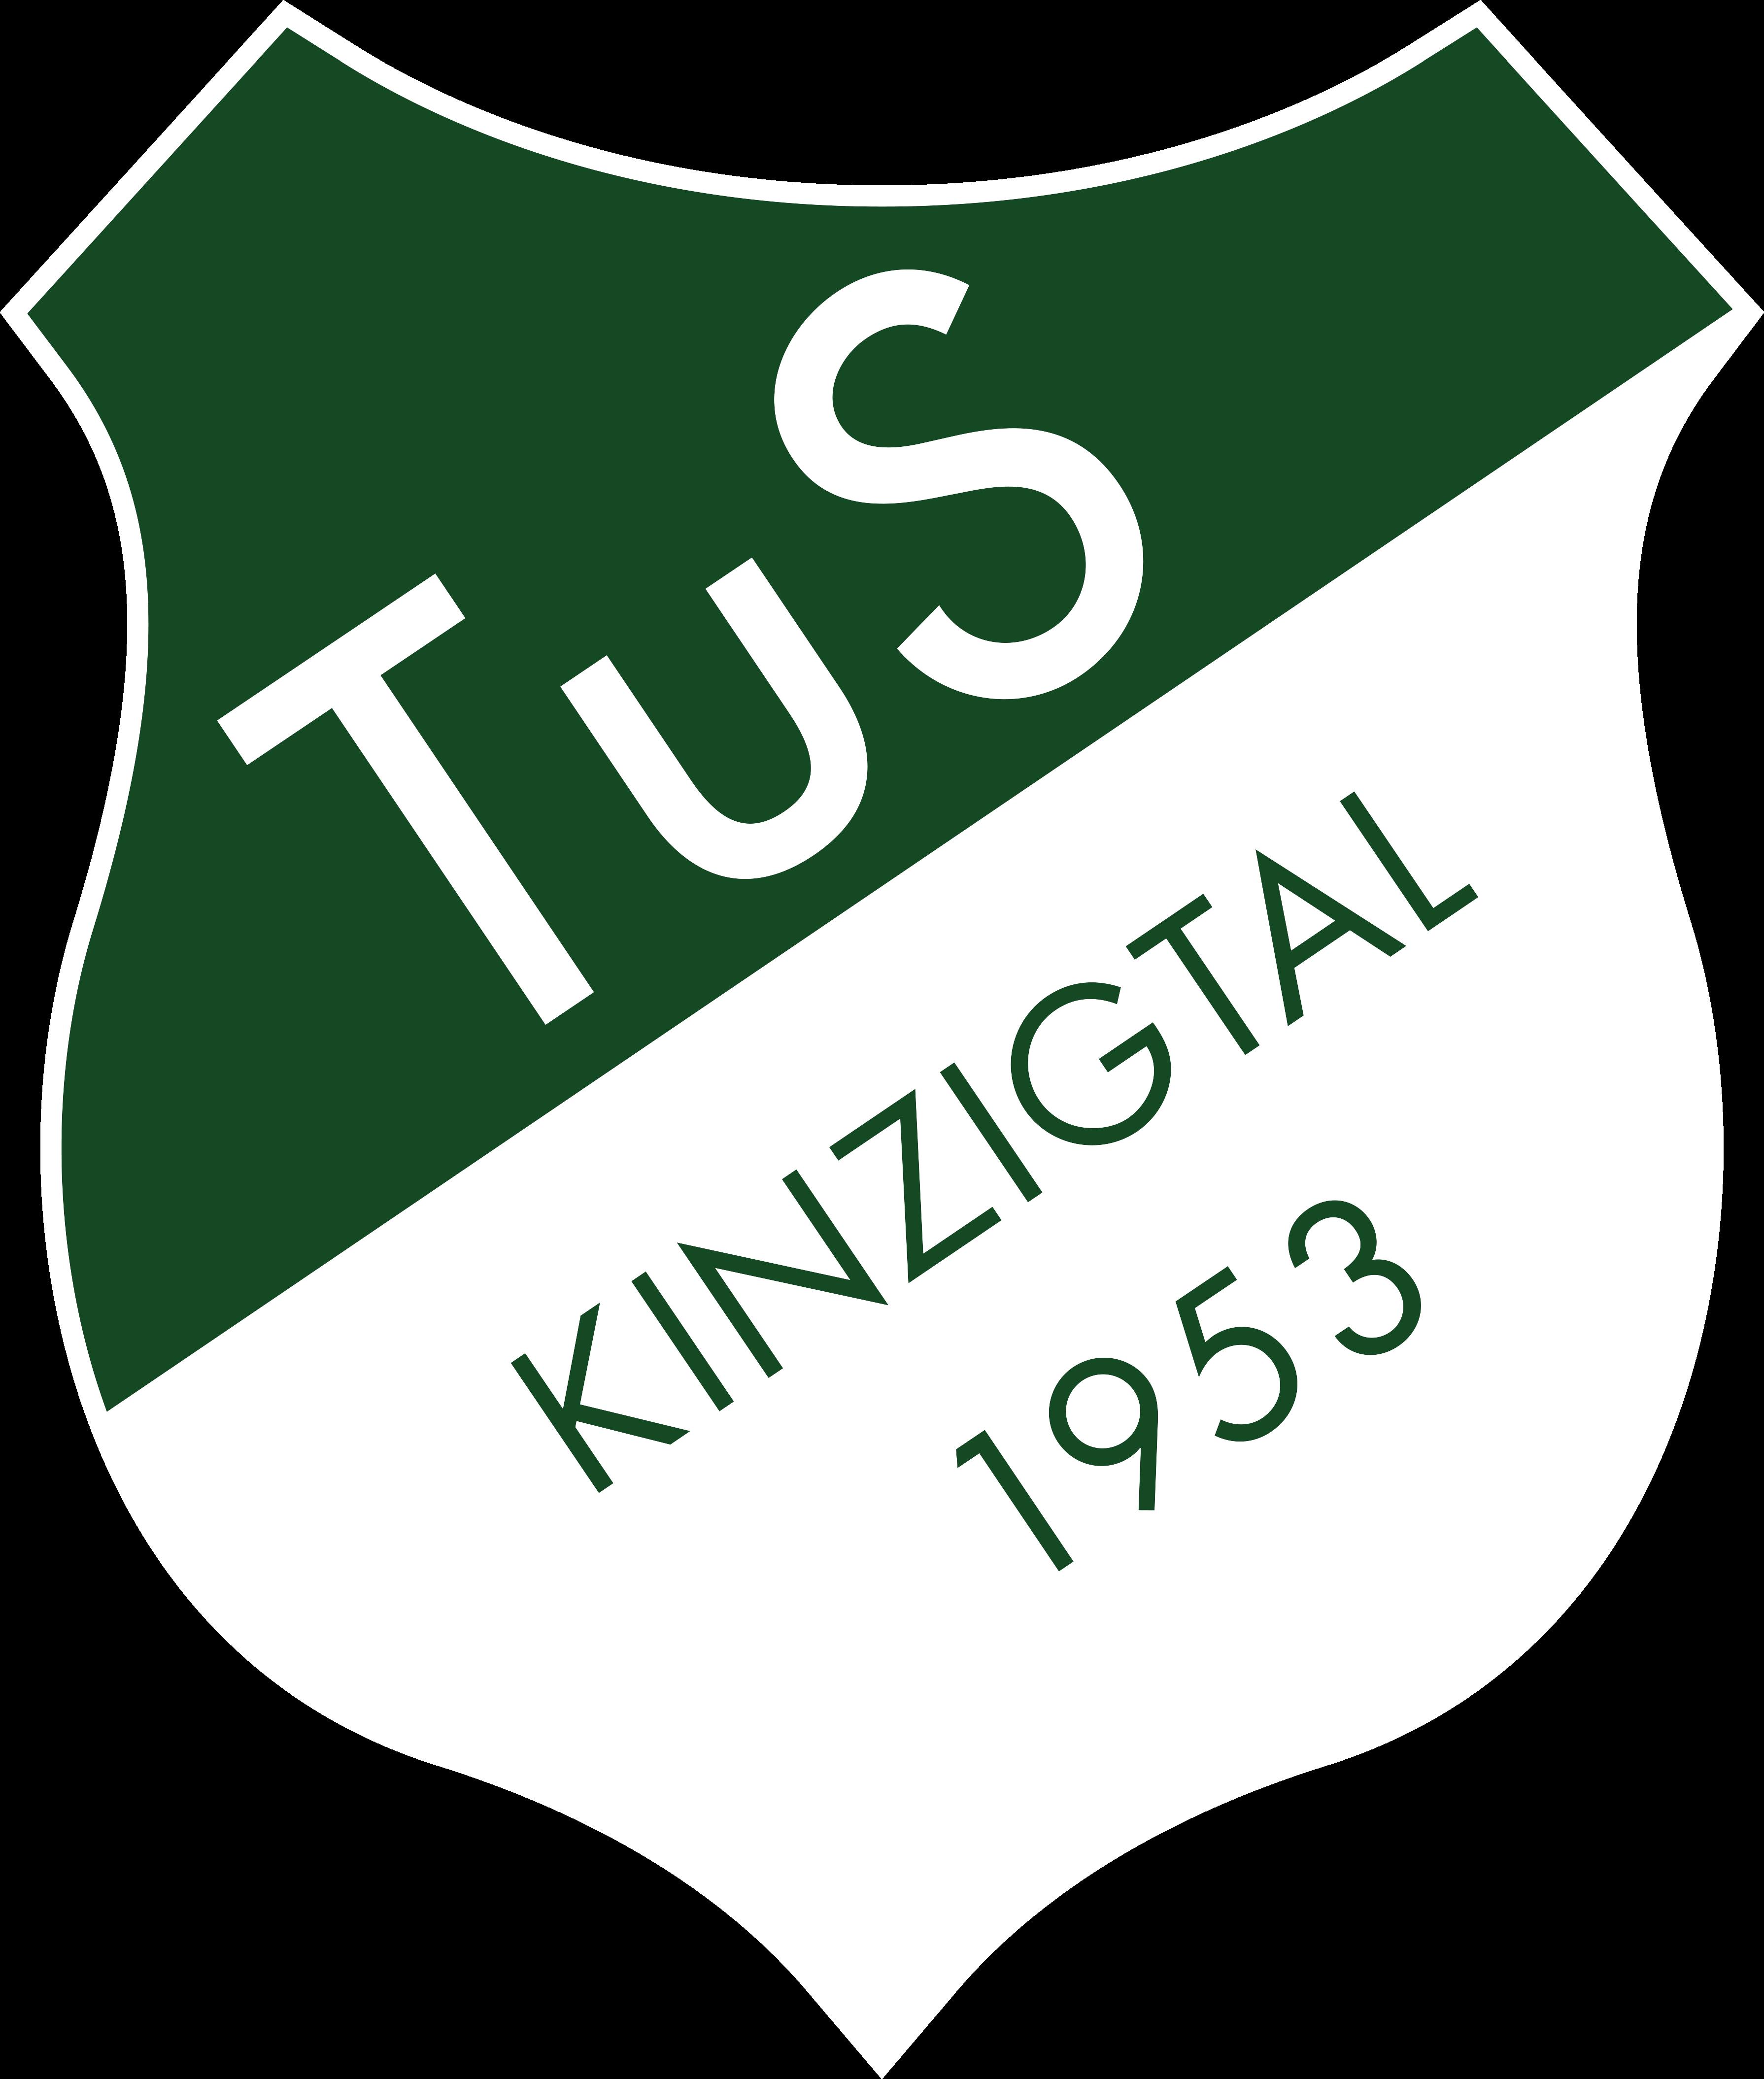 TuS Kinzigtal 1953 e.V.